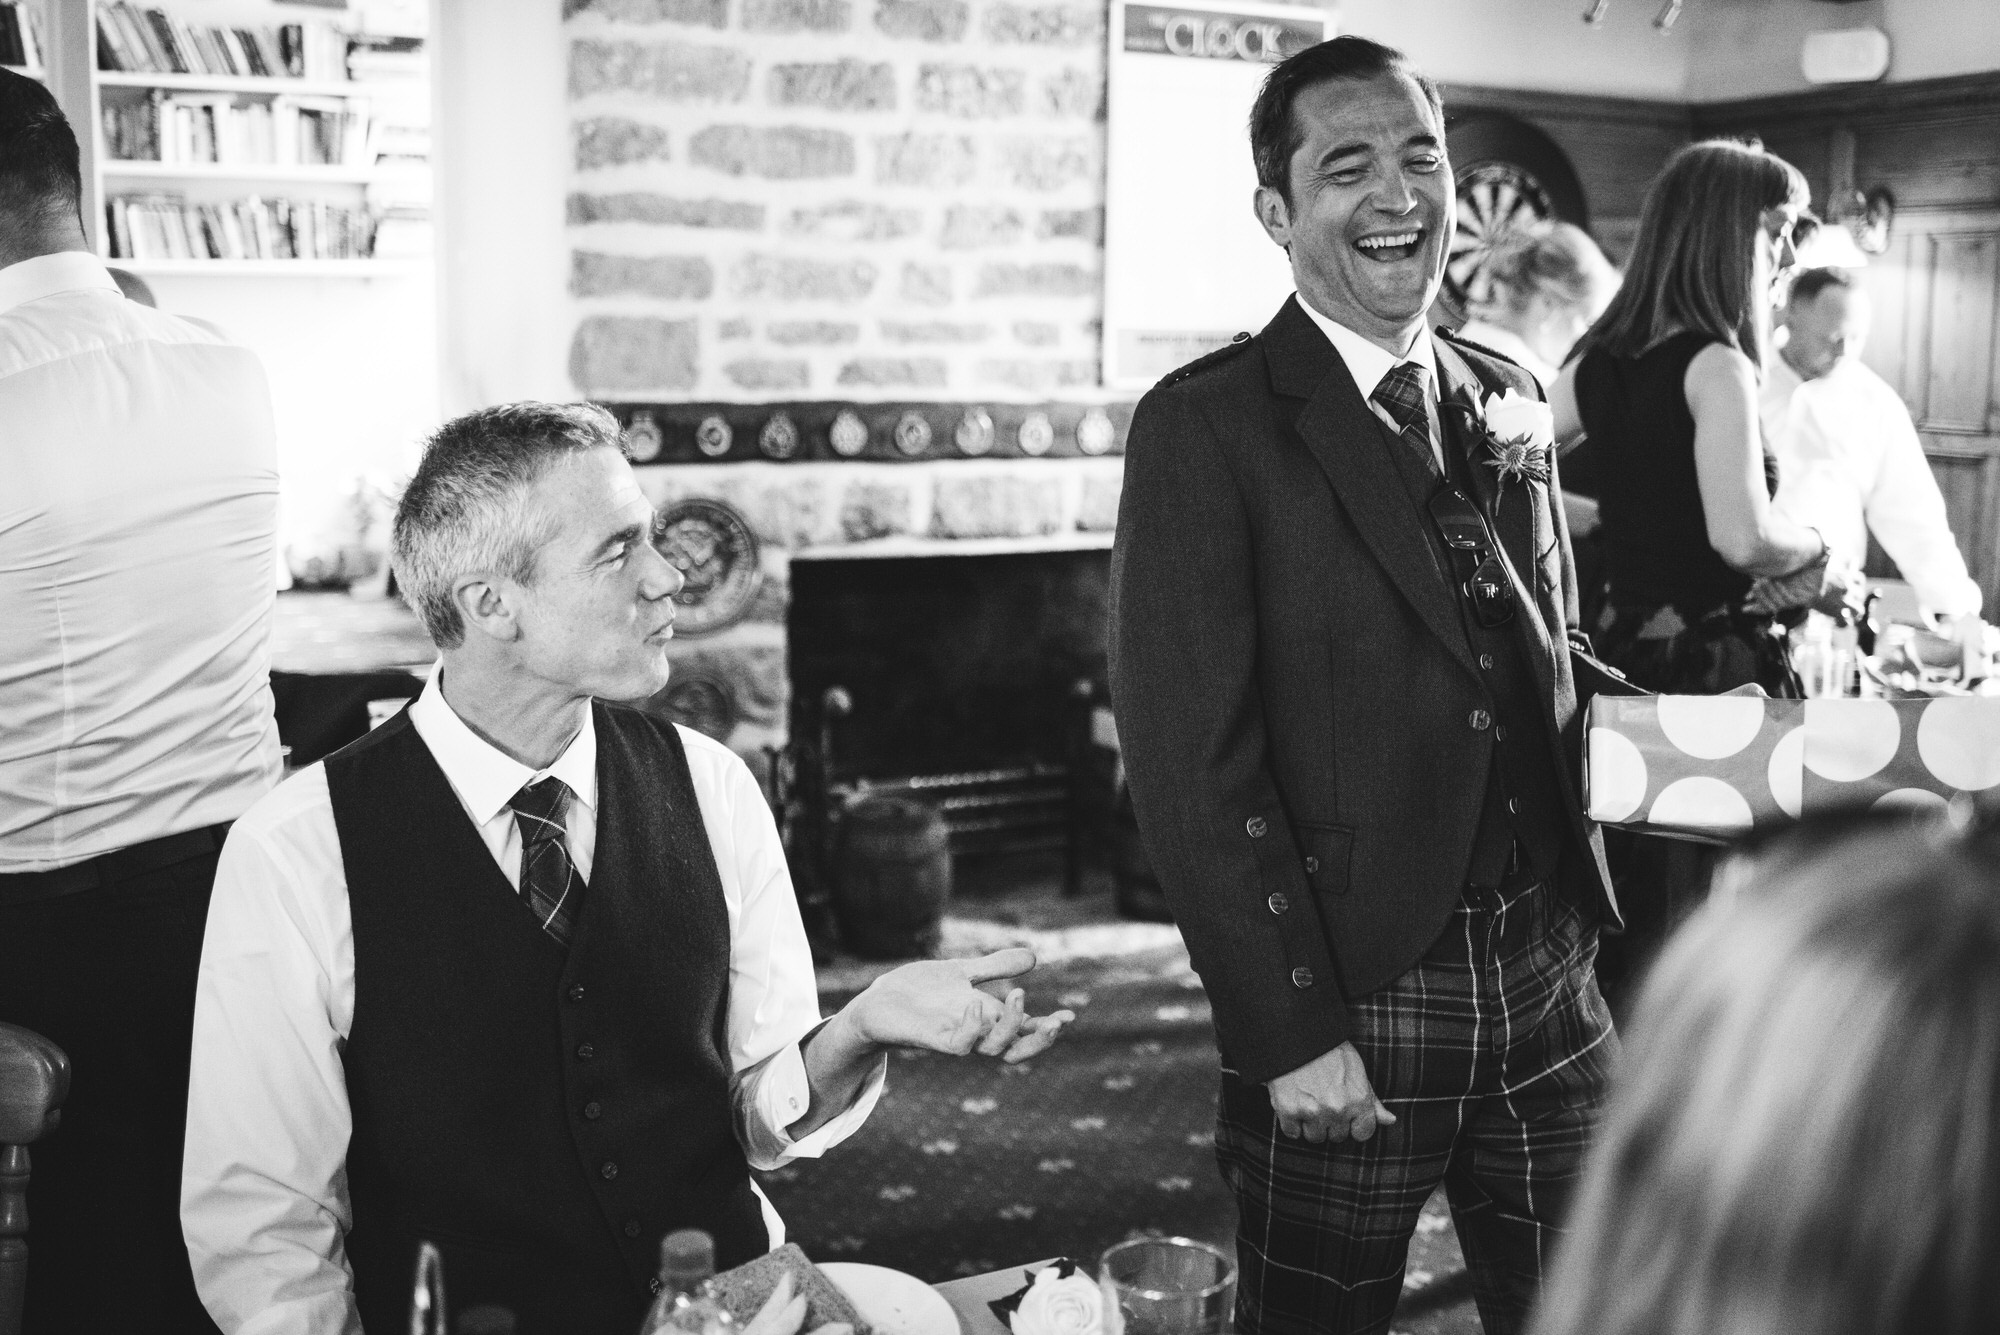 Dorset marquee wedding by the sea simon biffen photography 3